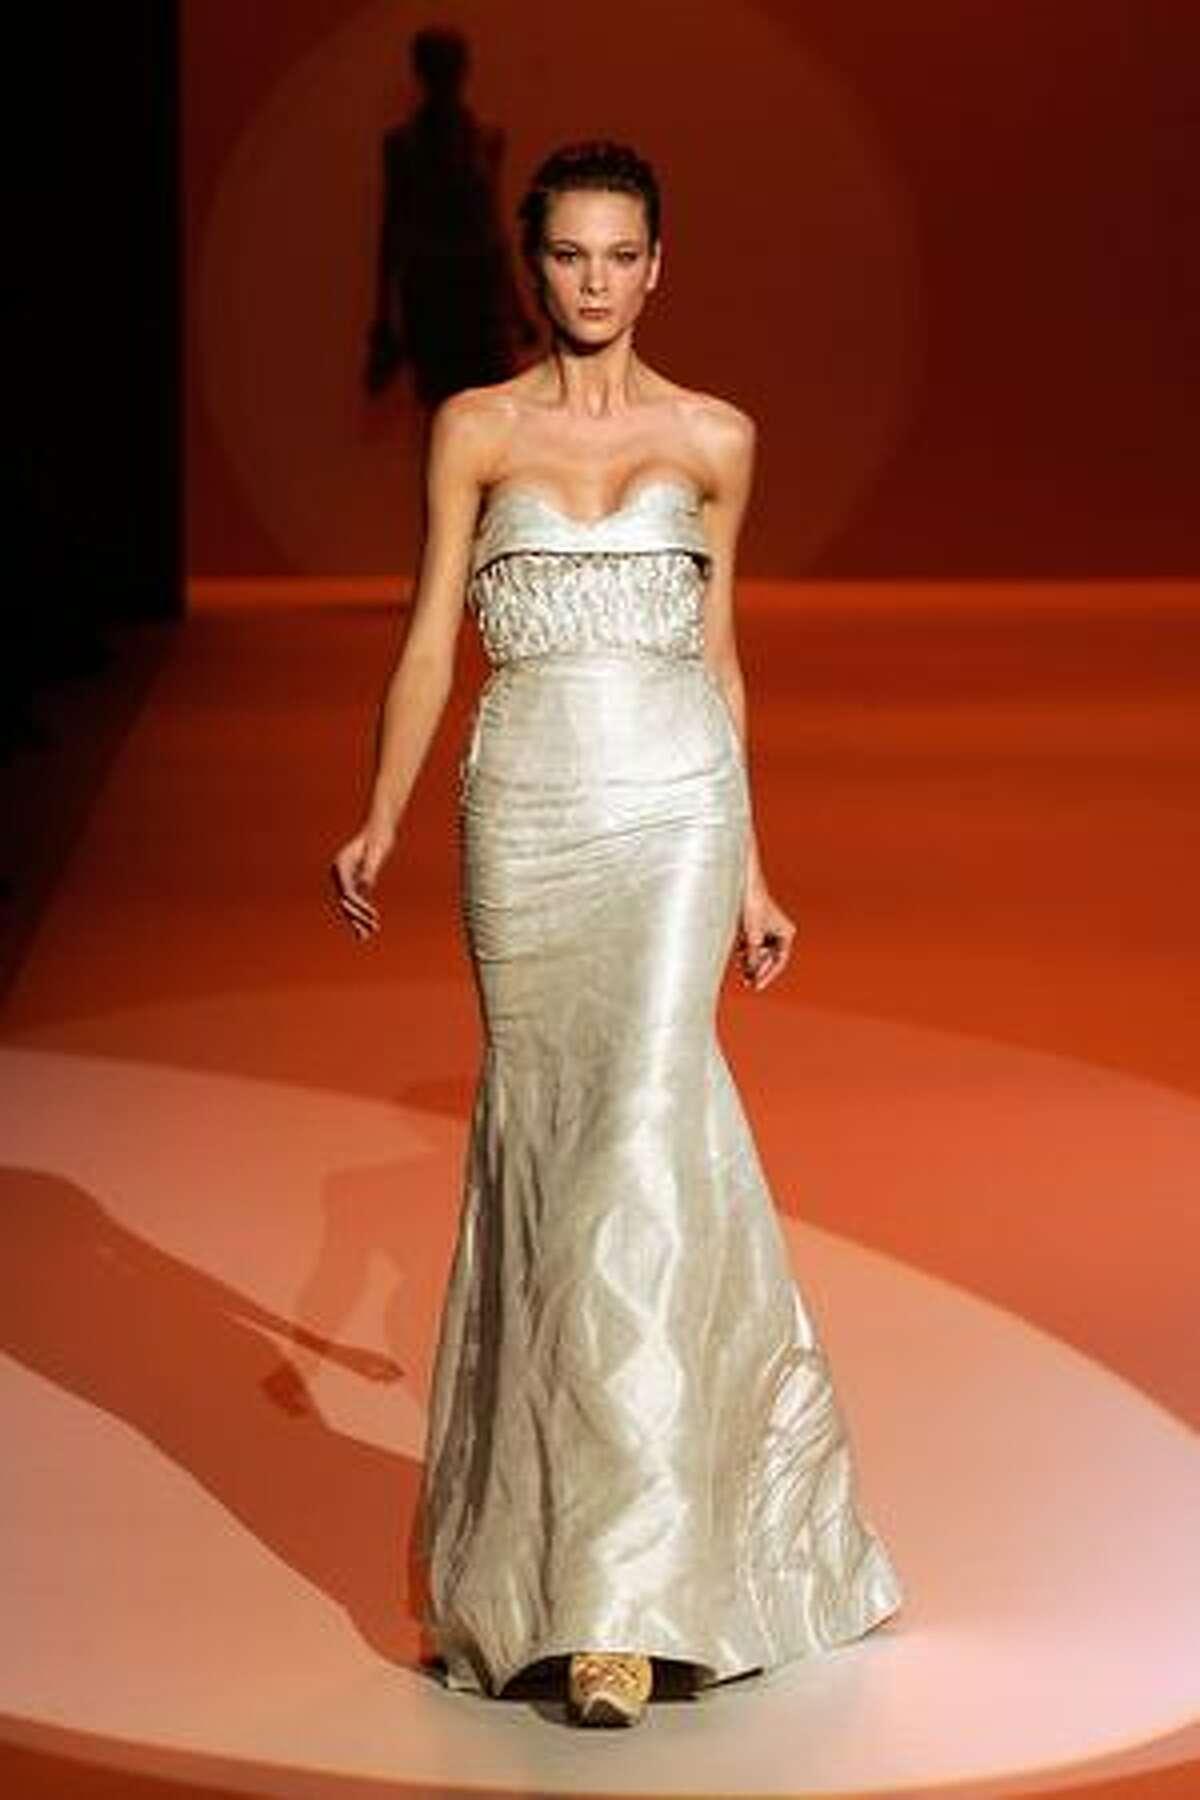 A model walks the runway at Carolina Herrera Spring 2010 fashion show at Bryant Park in New York, New York.